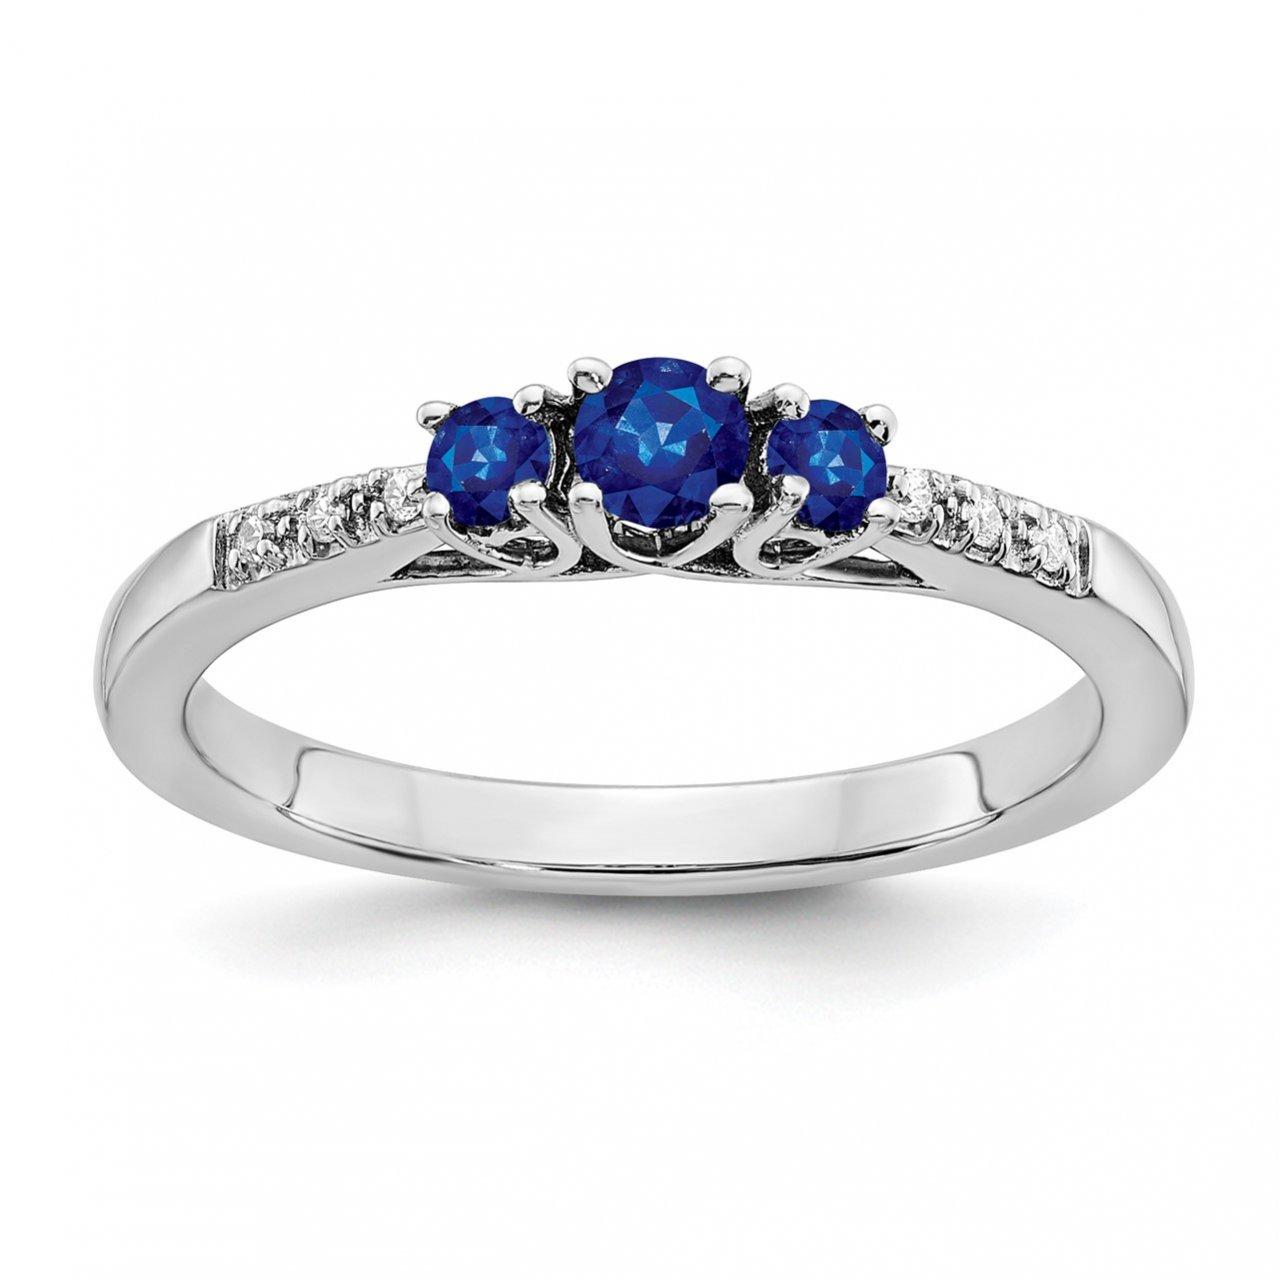 14k White Gold Sapphire and Diamond 3-stone Ring